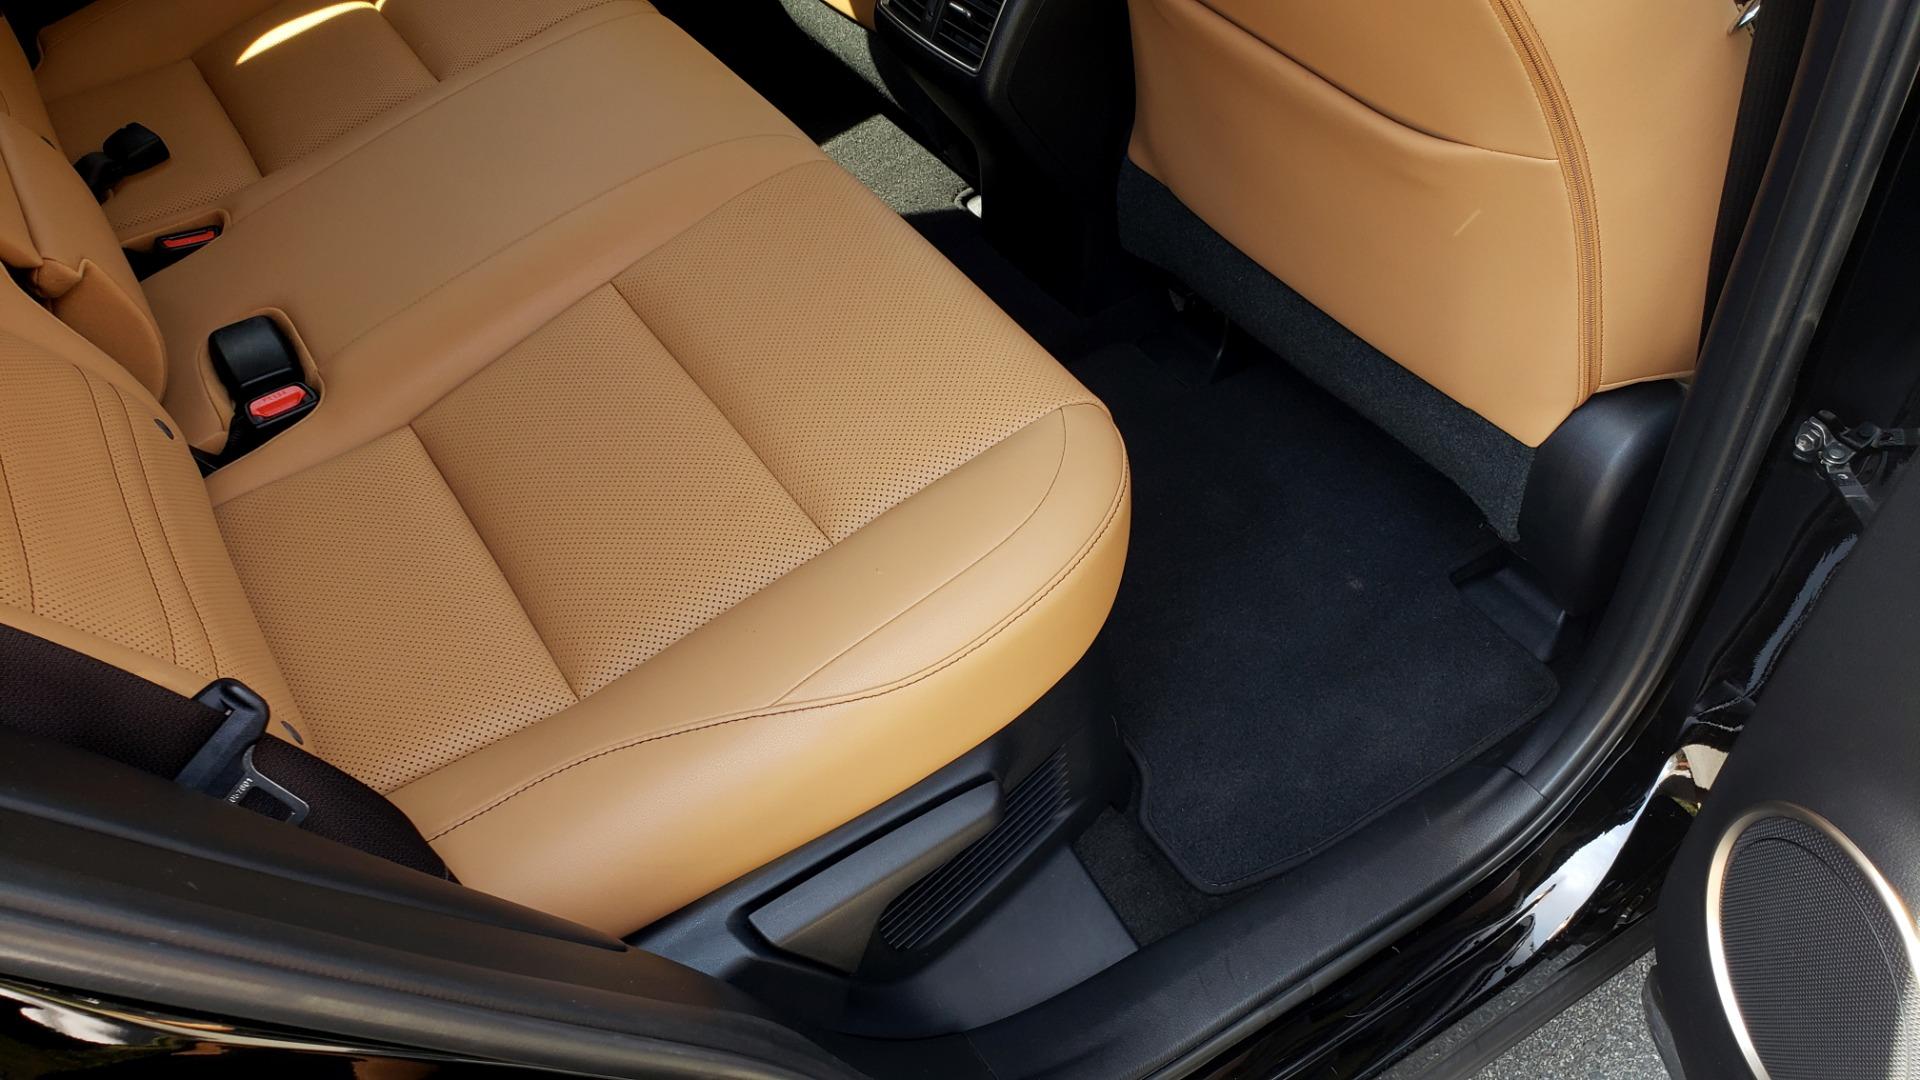 Used 2016 Lexus NX 200T PREM PKG / NAV / SUNROOF / PRE-COLLISION / PARK ASST for sale Sold at Formula Imports in Charlotte NC 28227 70